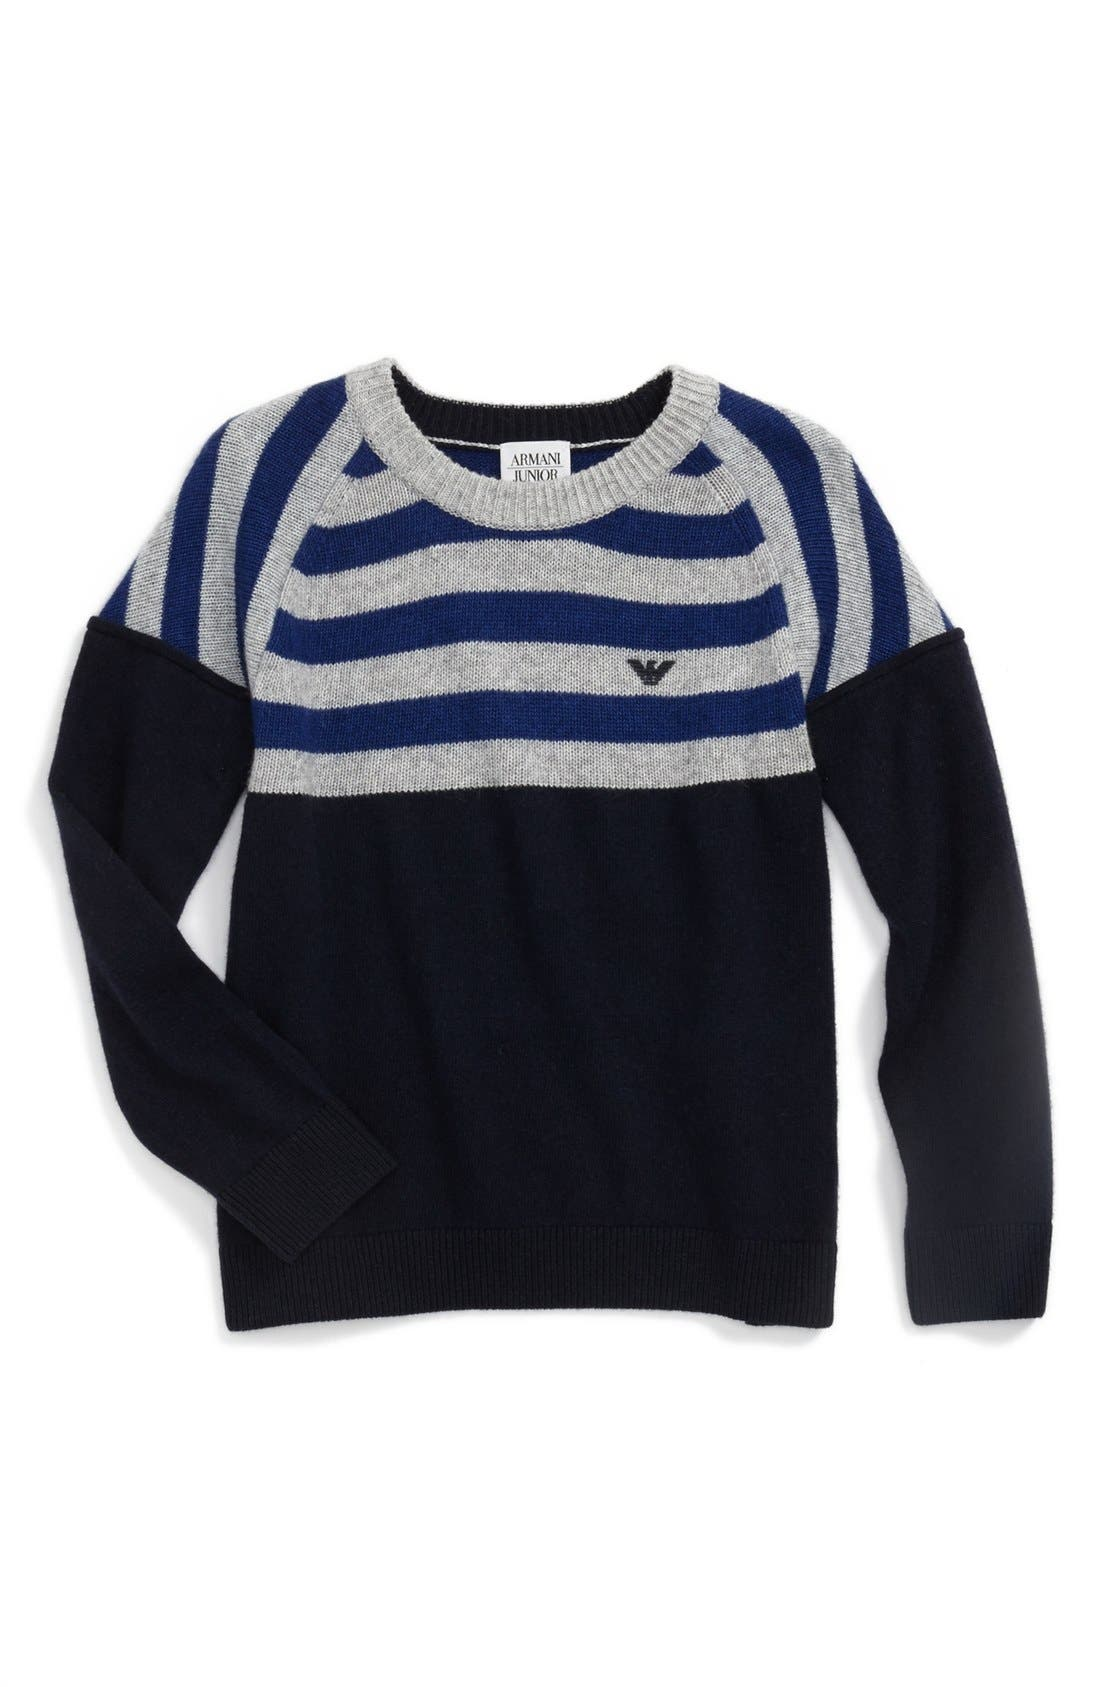 Alternate Image 1 Selected - Armani Junior Stripe Sweater (Little Boys & Big Boys)